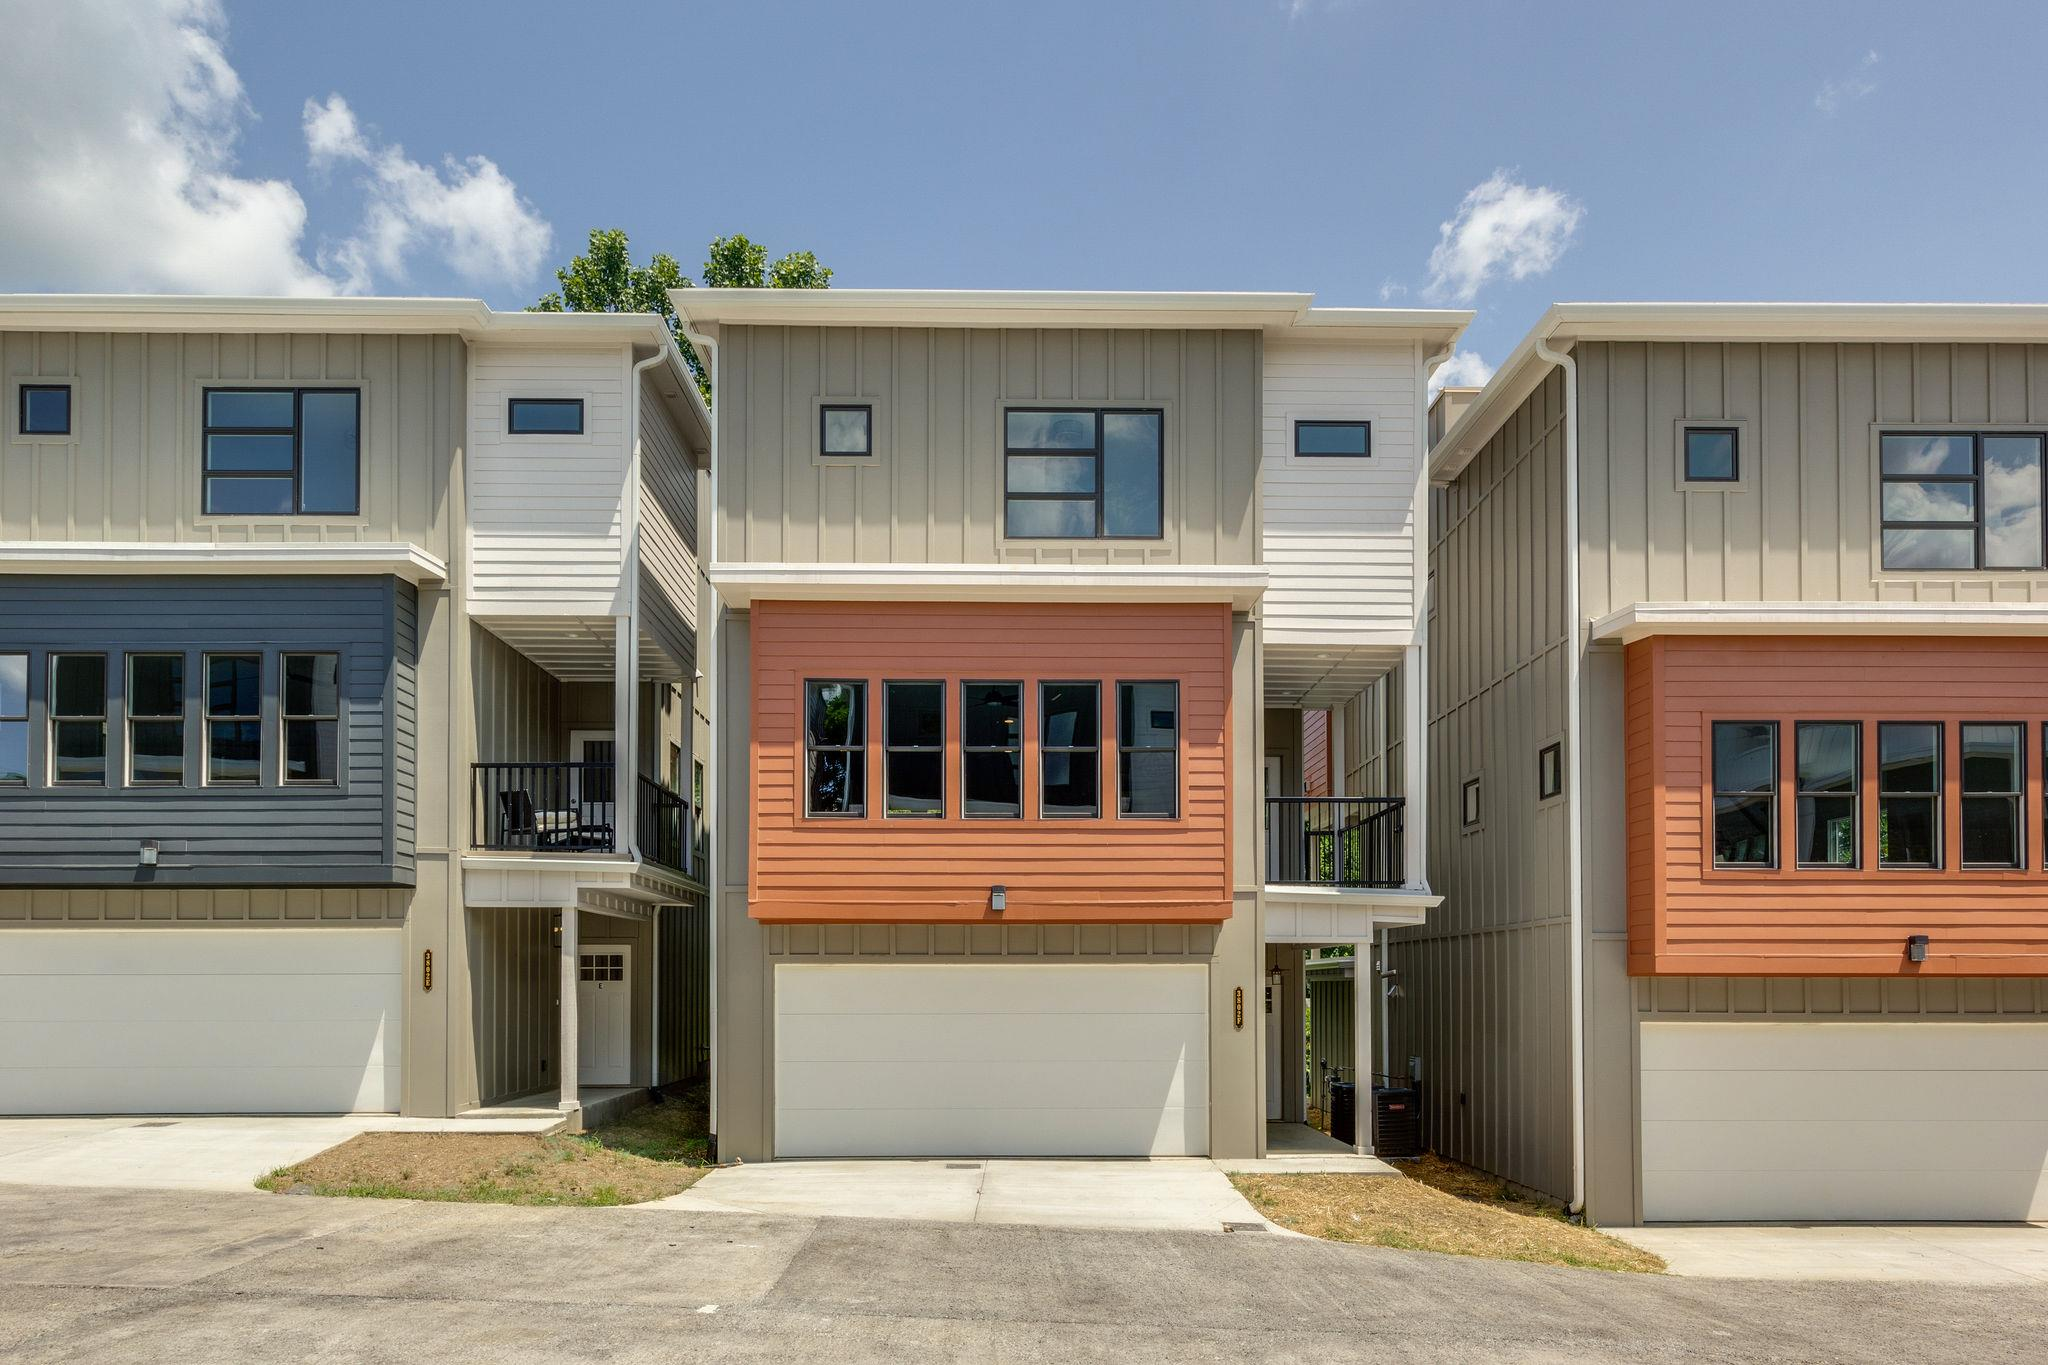 3802 Hutson Ave, Nashville, TN 37216 - Nashville, TN real estate listing